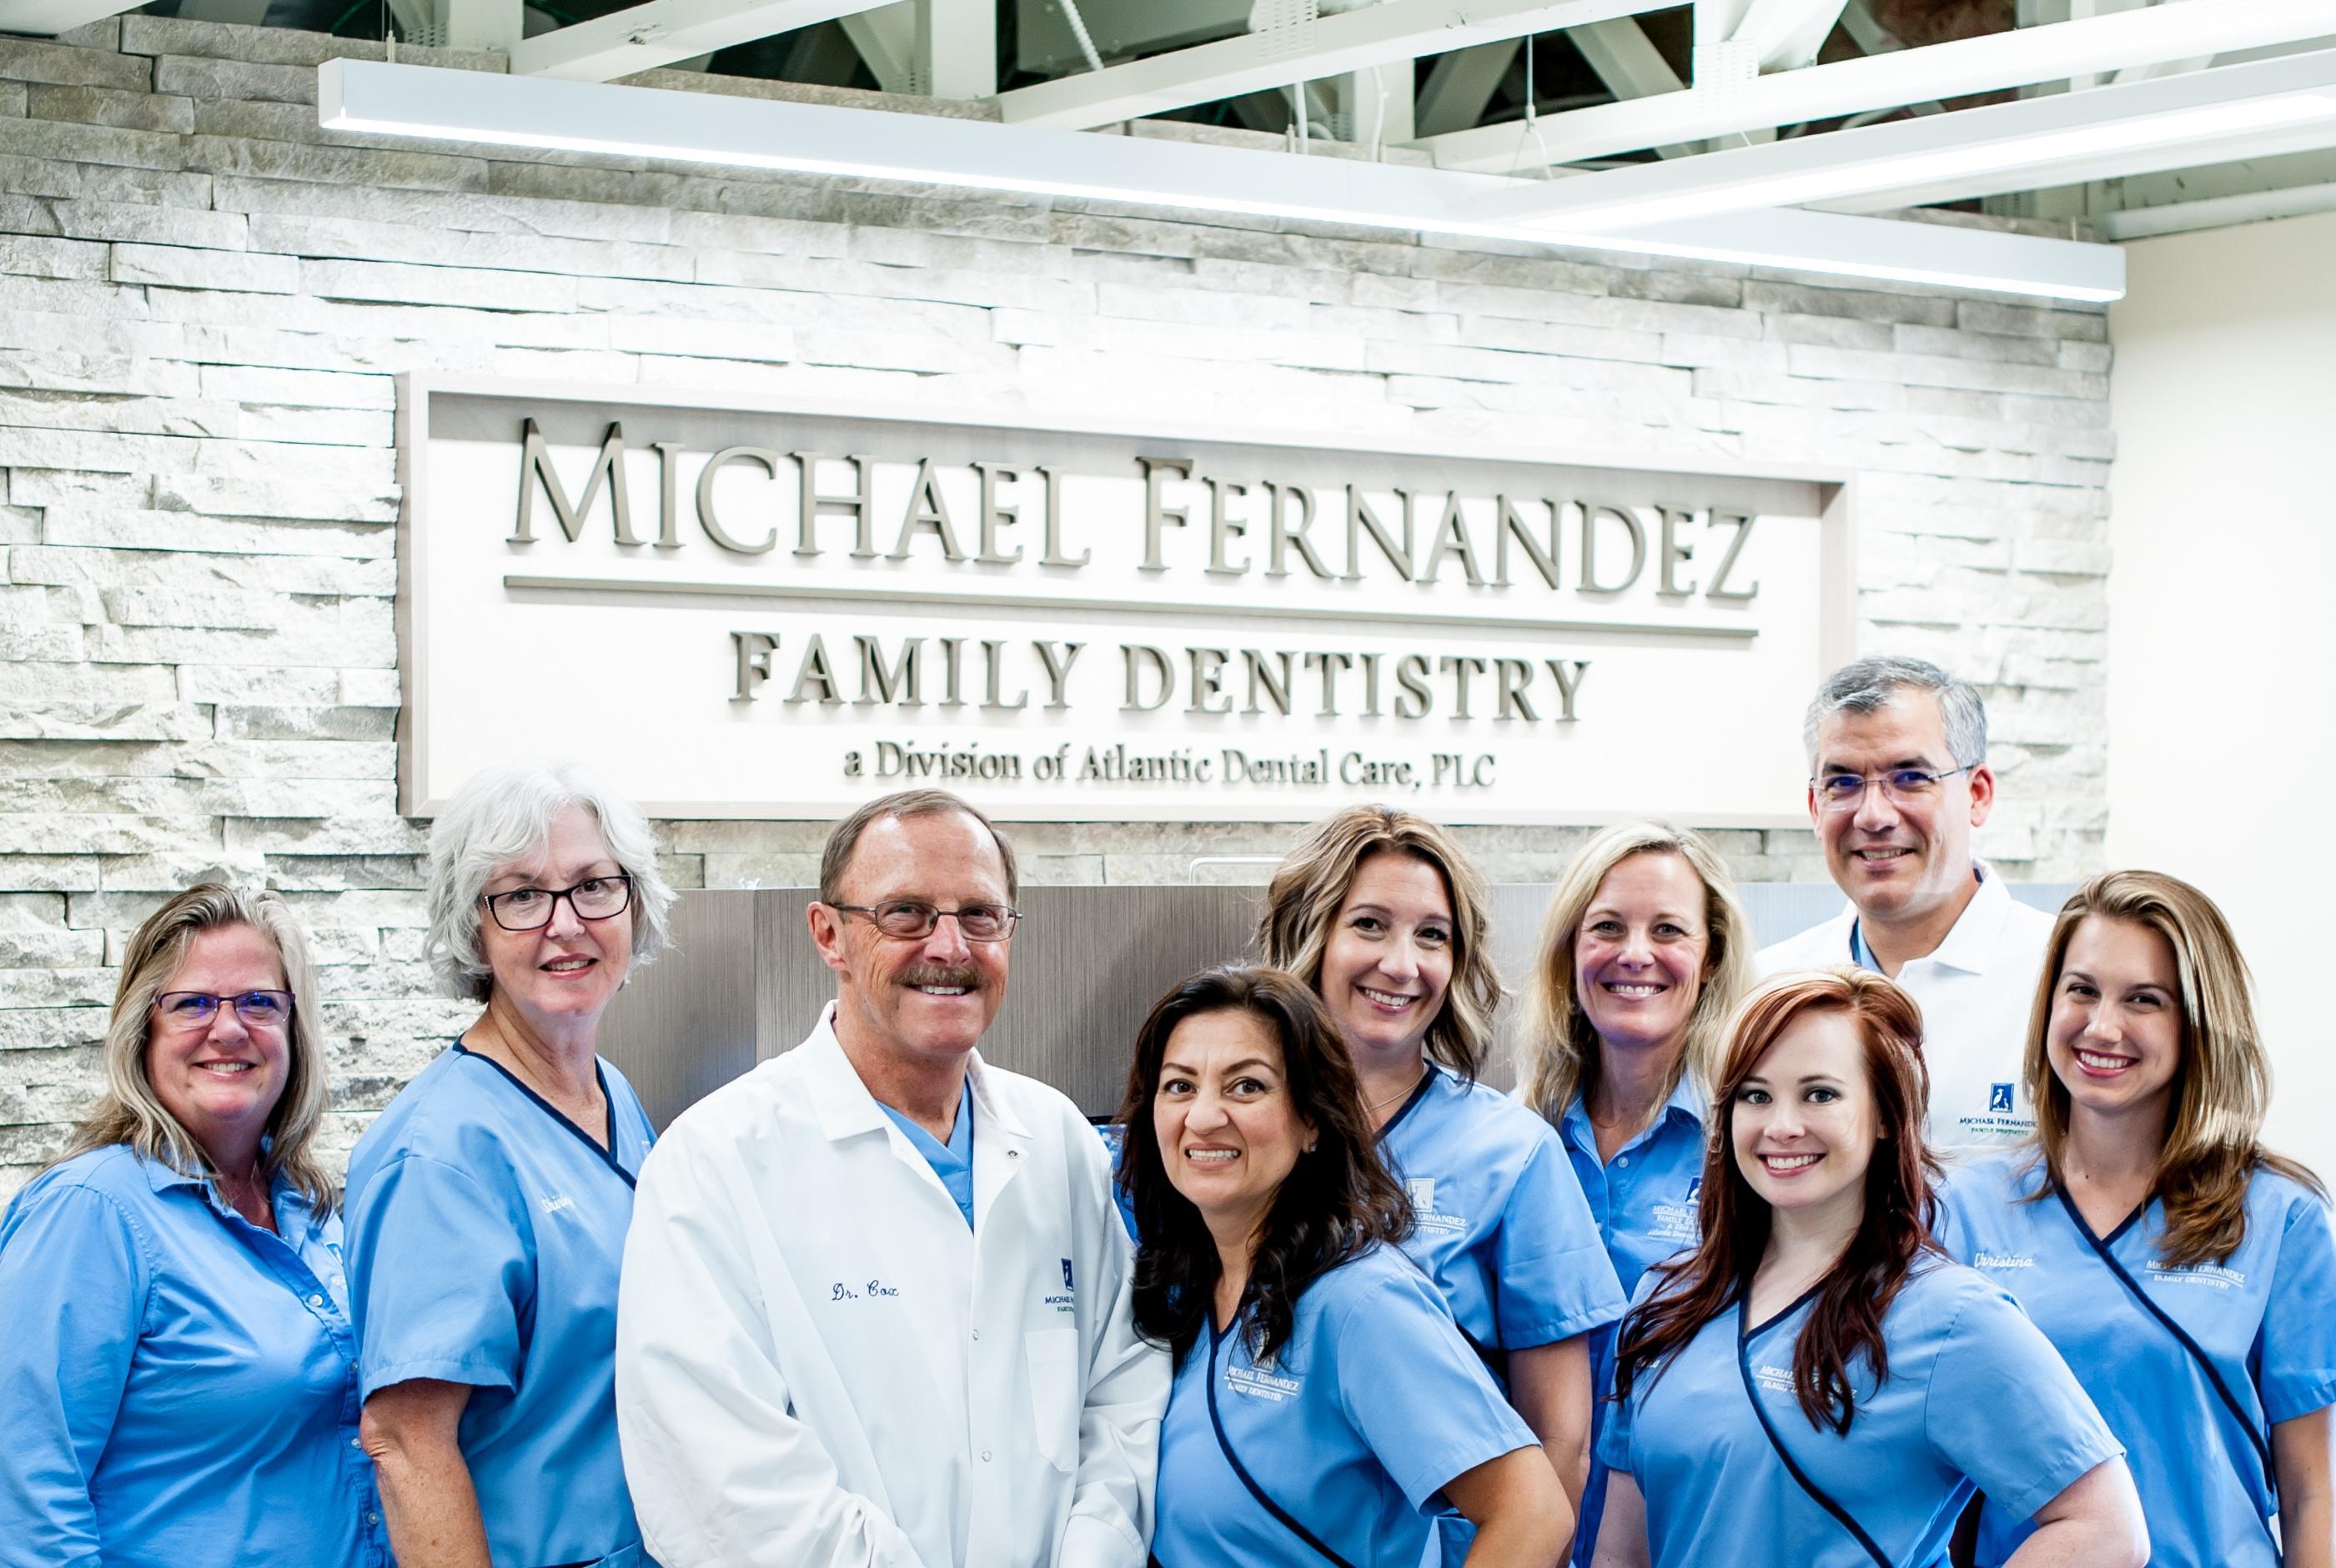 Michael Fernandez Family Dentistry image 10